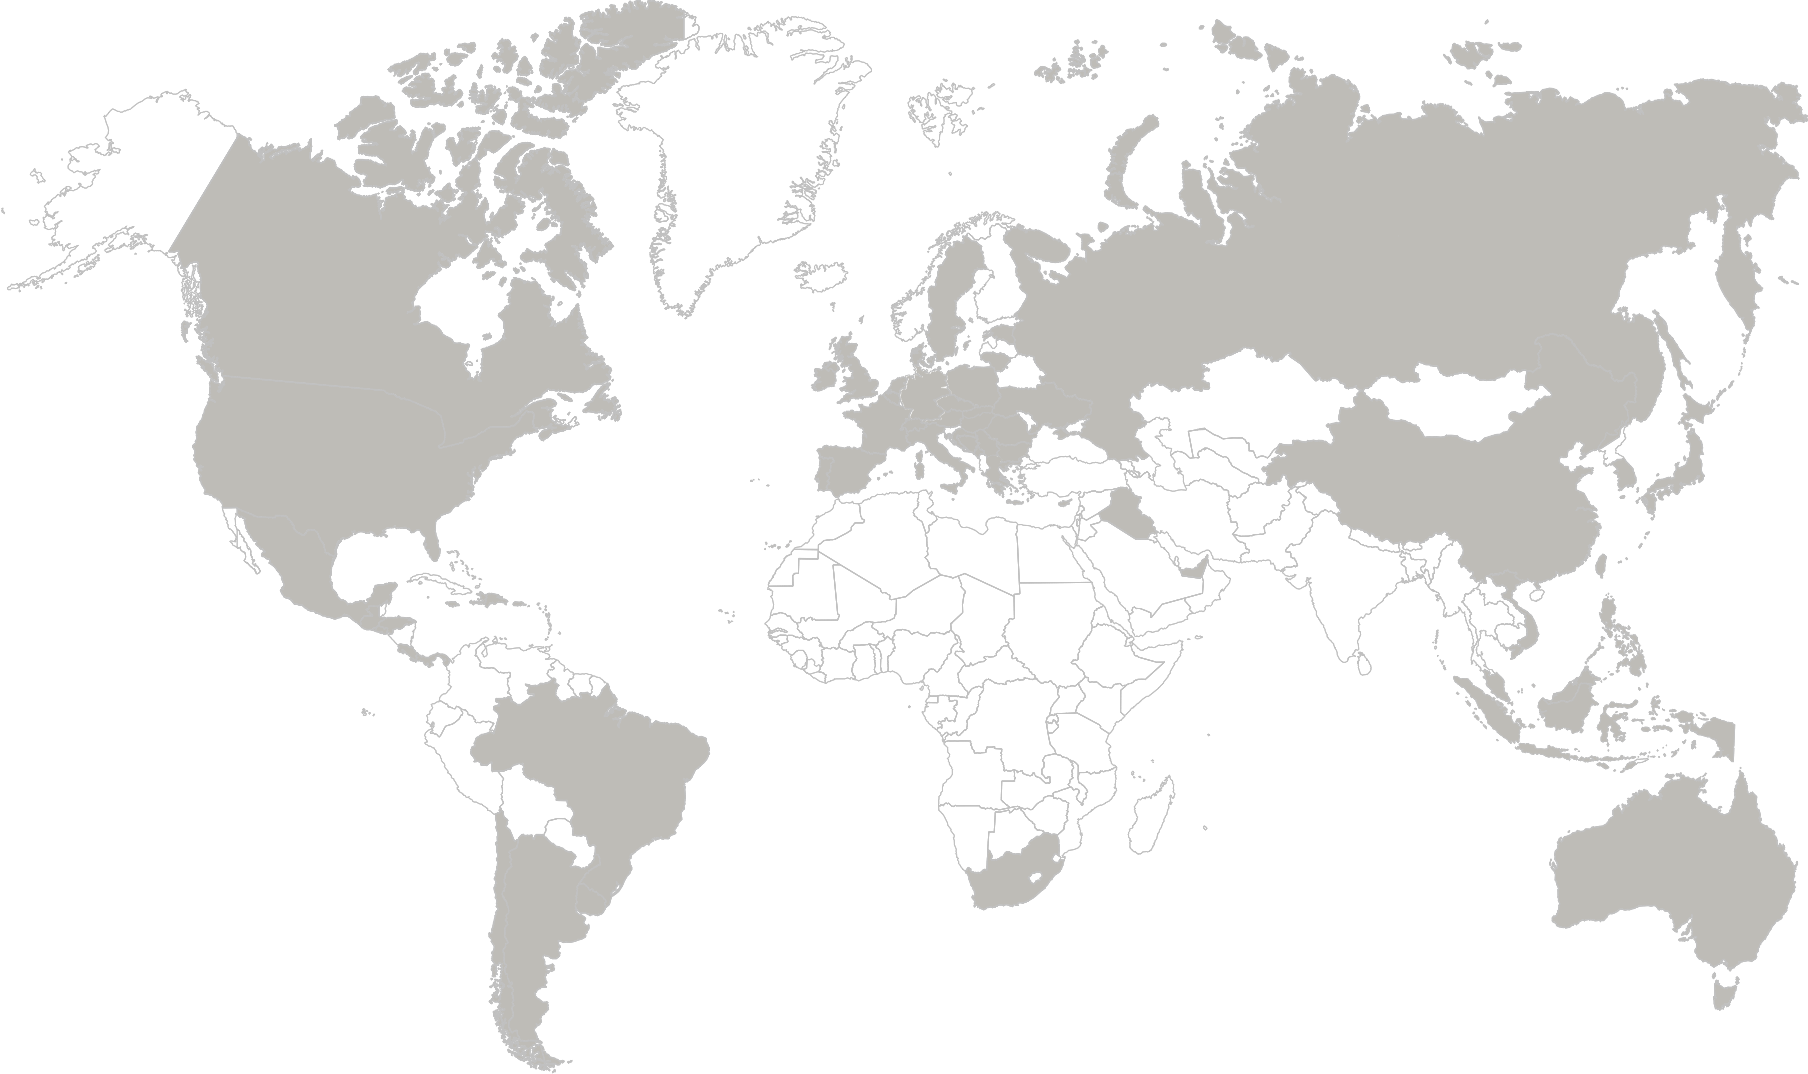 gruppo-veronesi-mappe-export